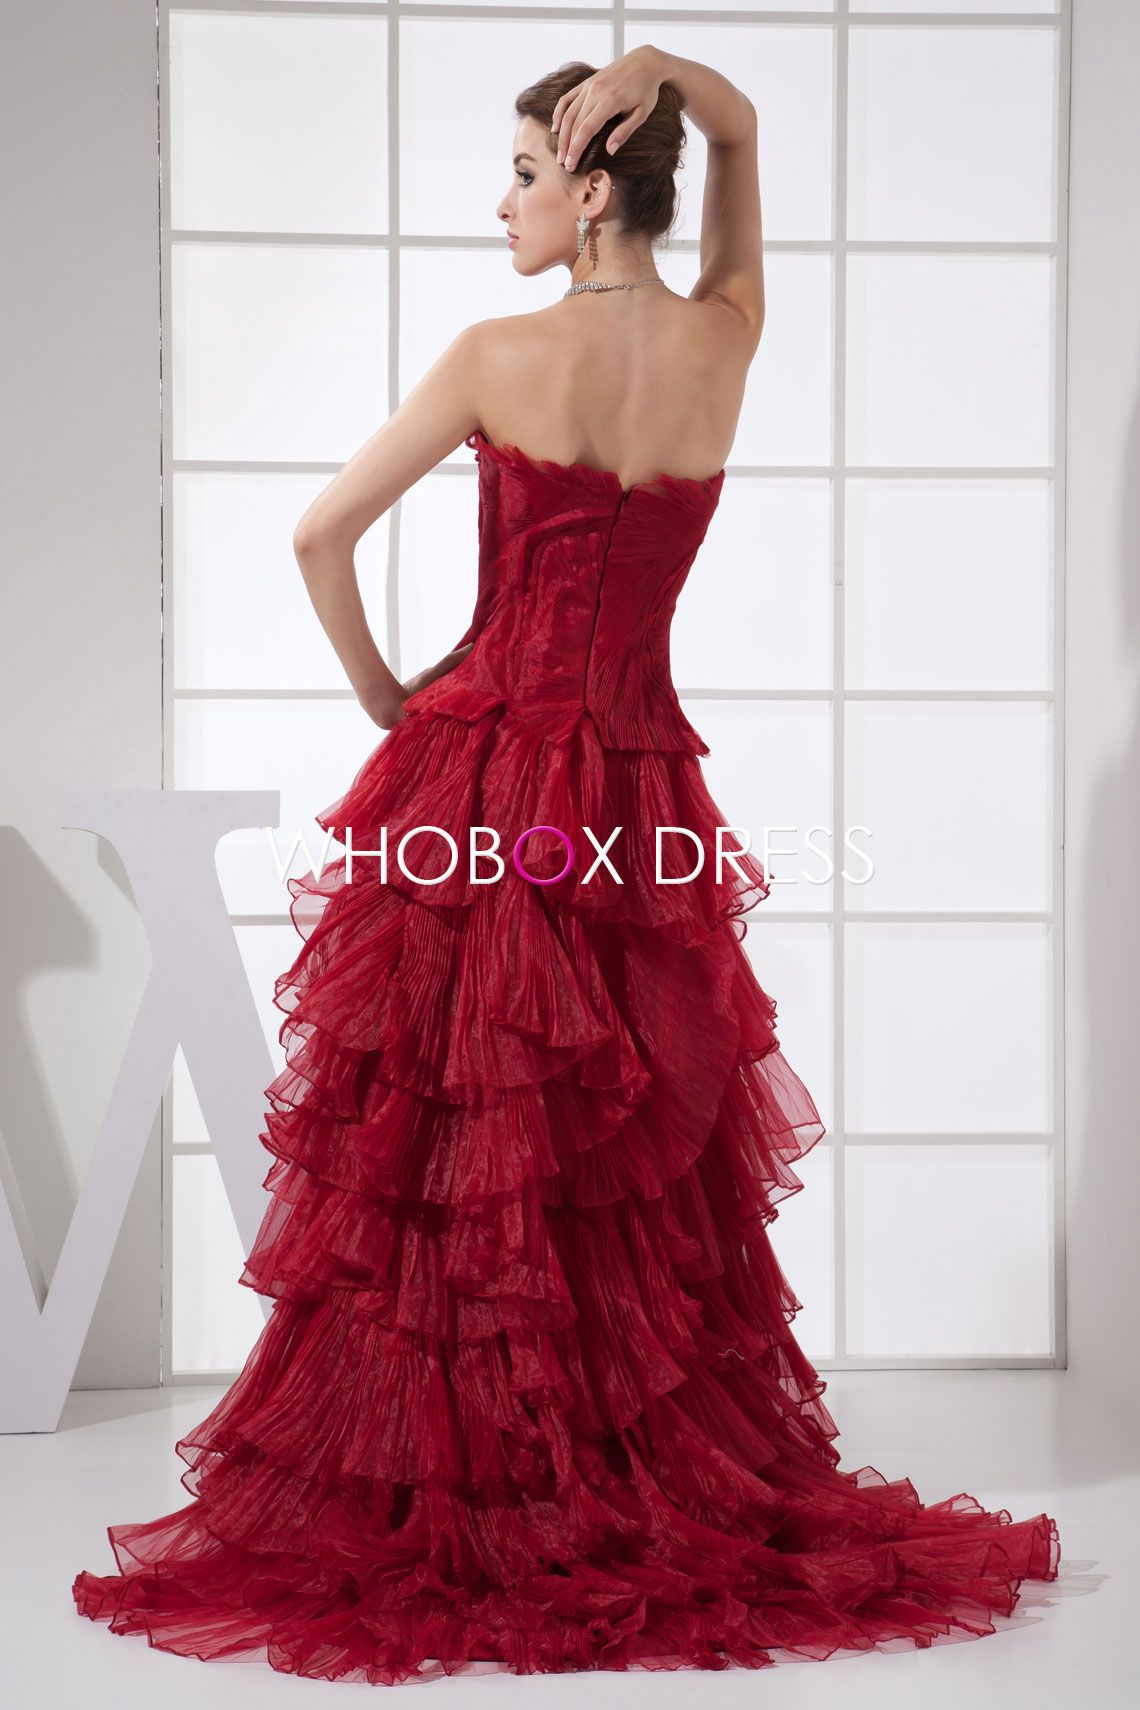 Bridesmaid dresses bridesmaid dresses red it is